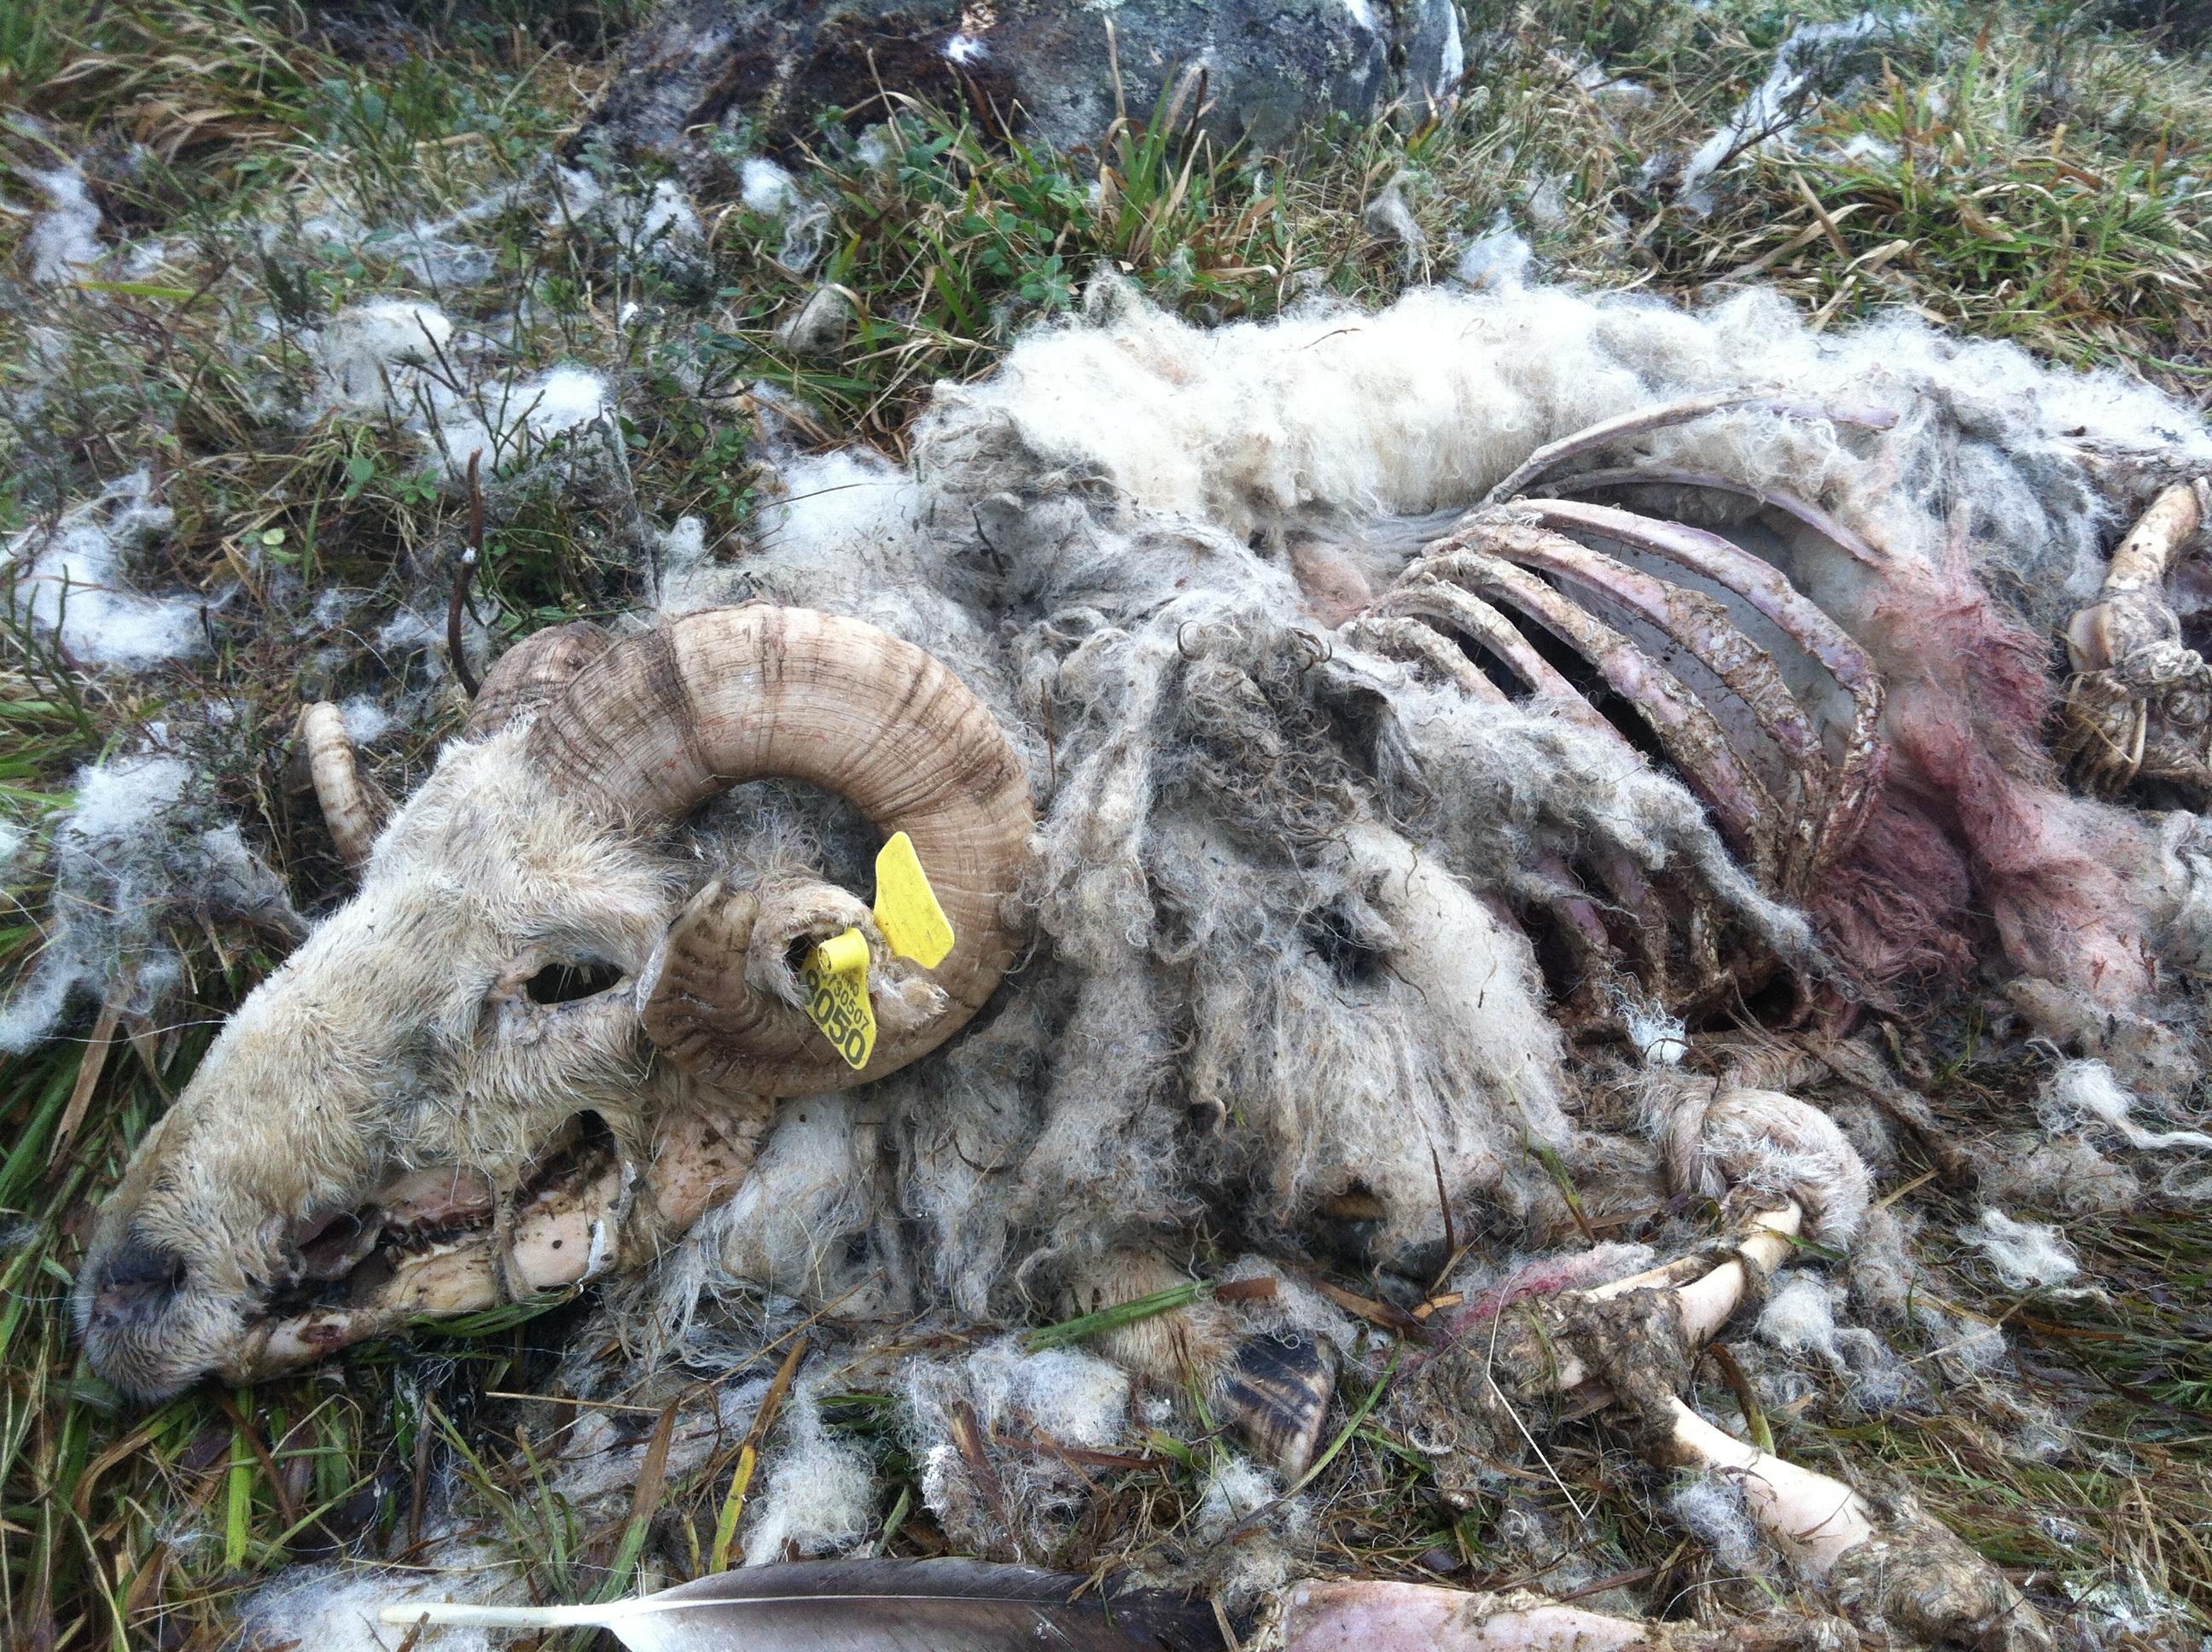 Fotos gratis : pájaro, animal, fauna silvestre, oveja, muerto, vida ...